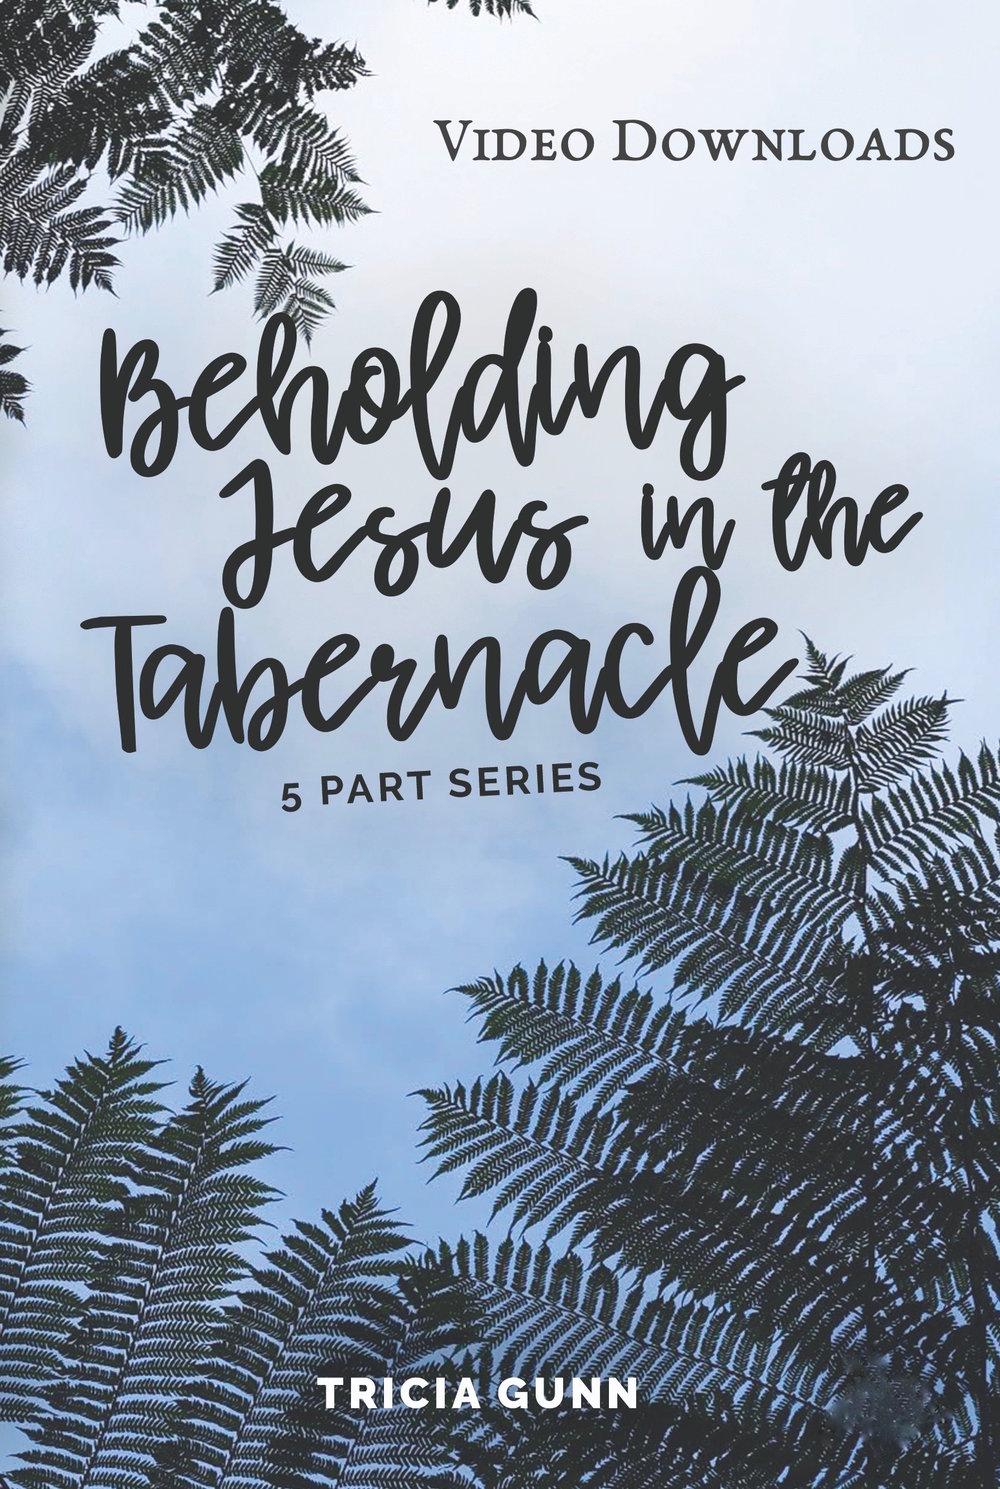 Beholding-Jesus-DVD-01, video complete.jpg